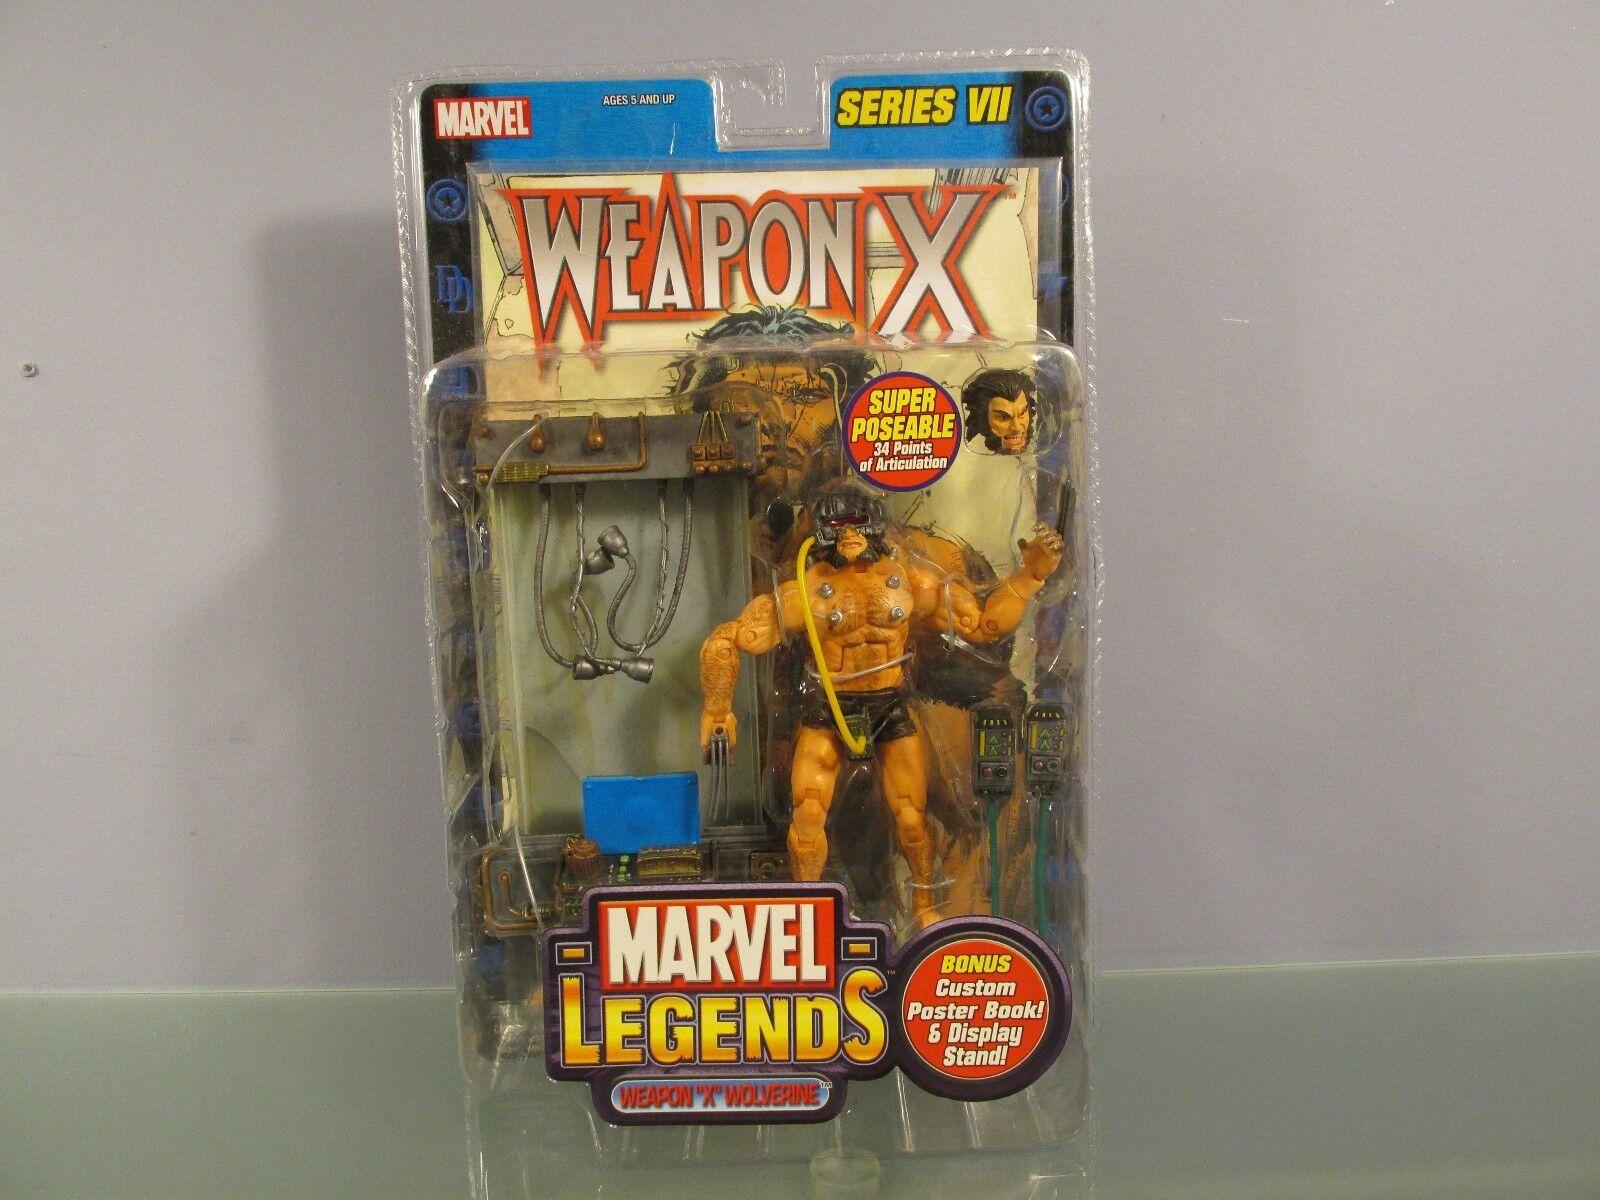 Marvel Leyendas Serie VII 7 arma X Wolverine Con Poster Book Juguete Biz X-men Raro